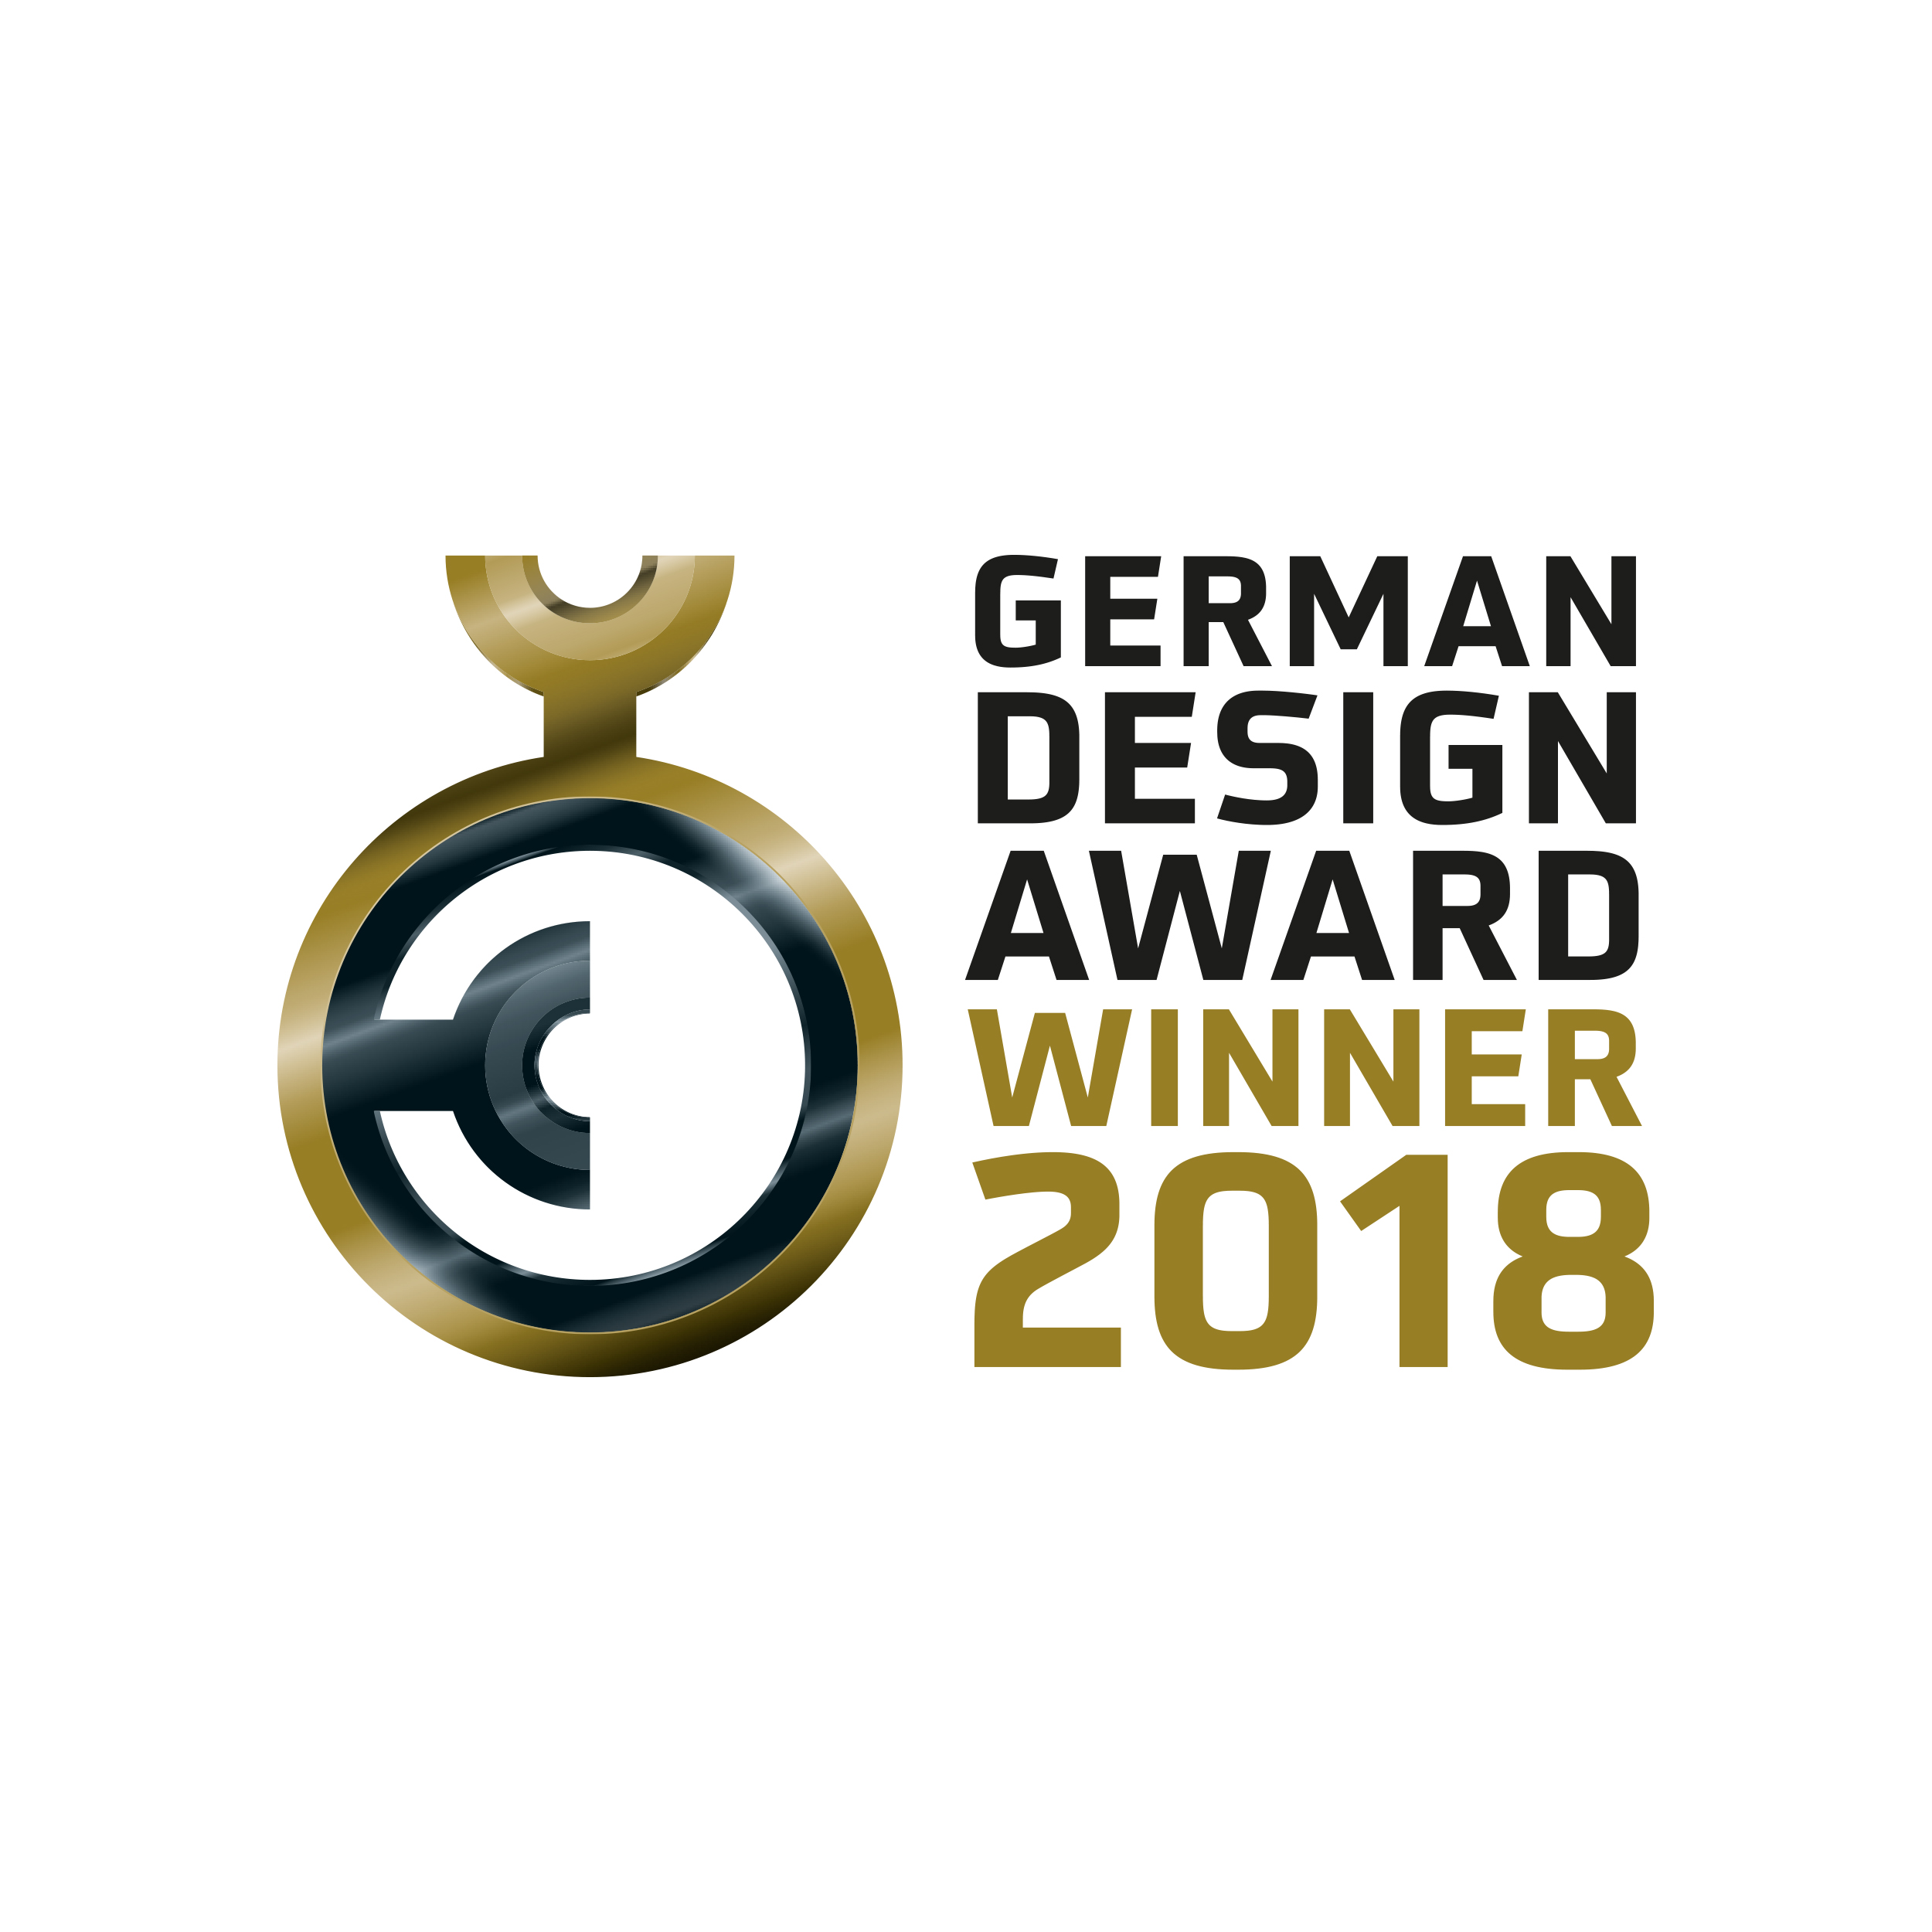 German Design Award 2018 - Winner, Subtle Floor Screens - Kauppi & Kauppi